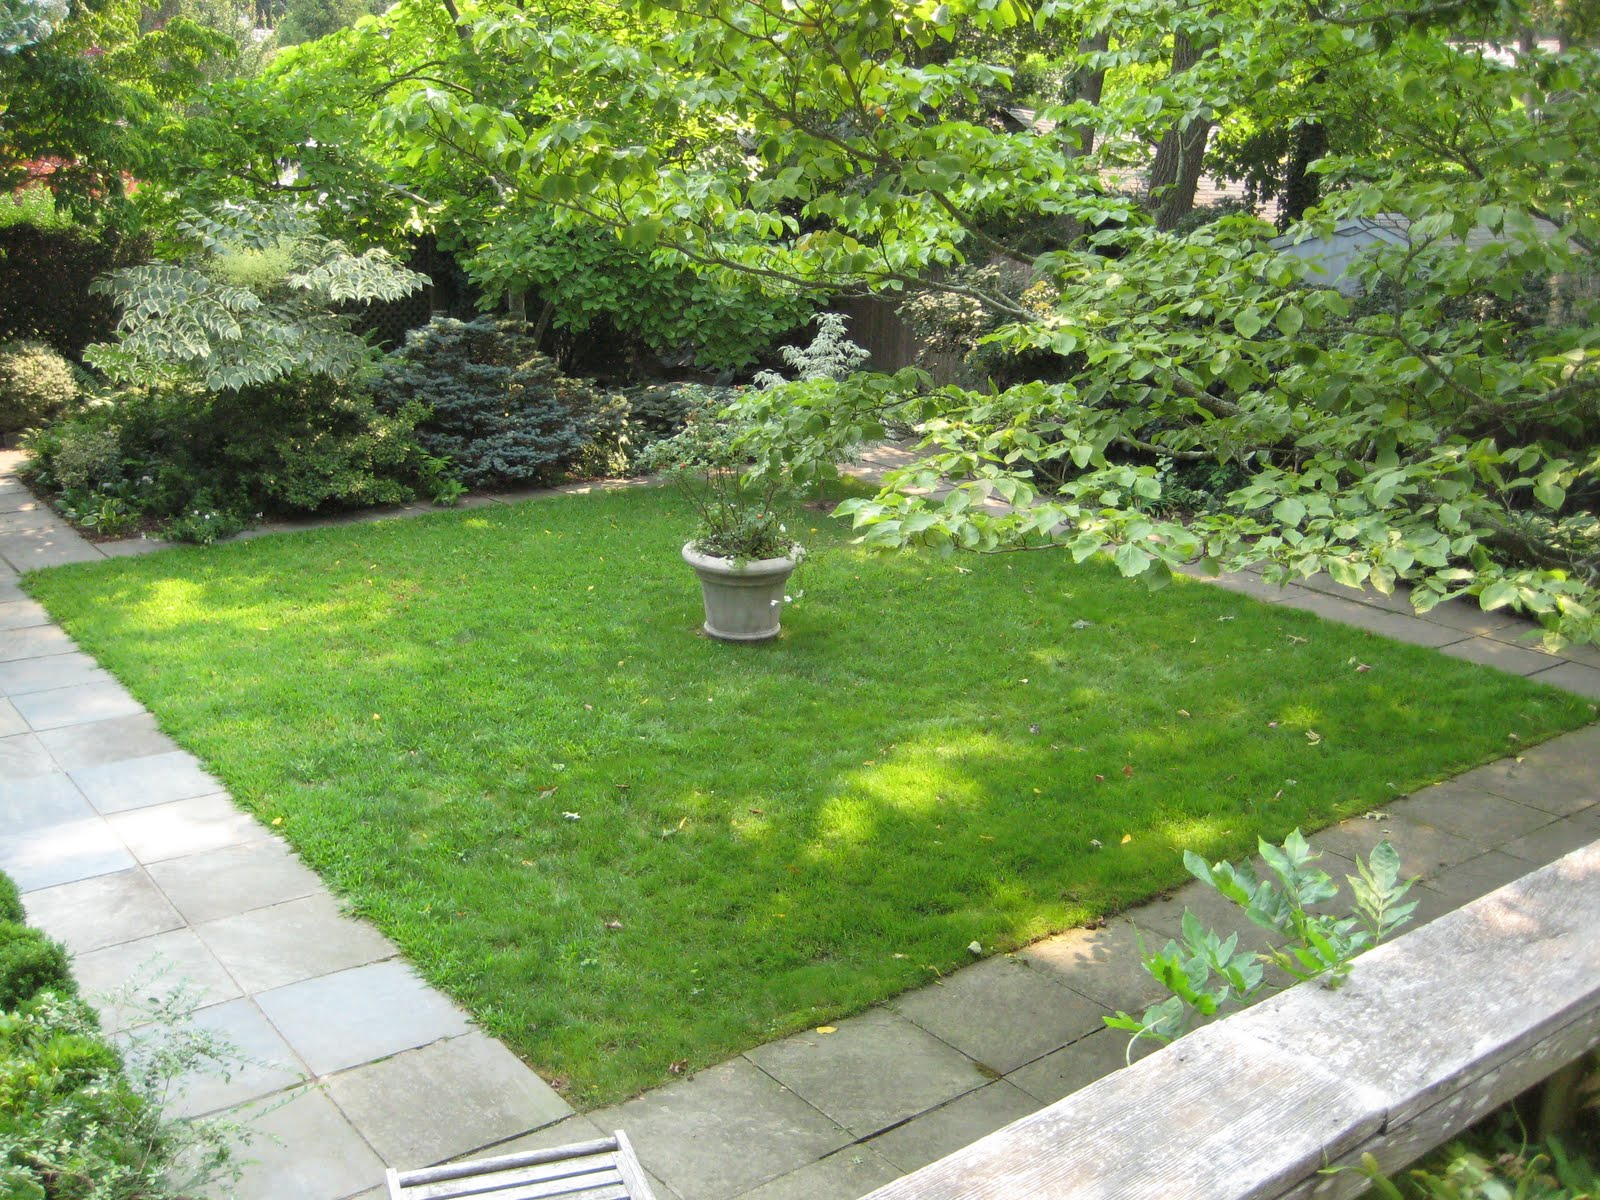 Paradis express lanford wilson 39 s sag harbor garden for 50ft garden design